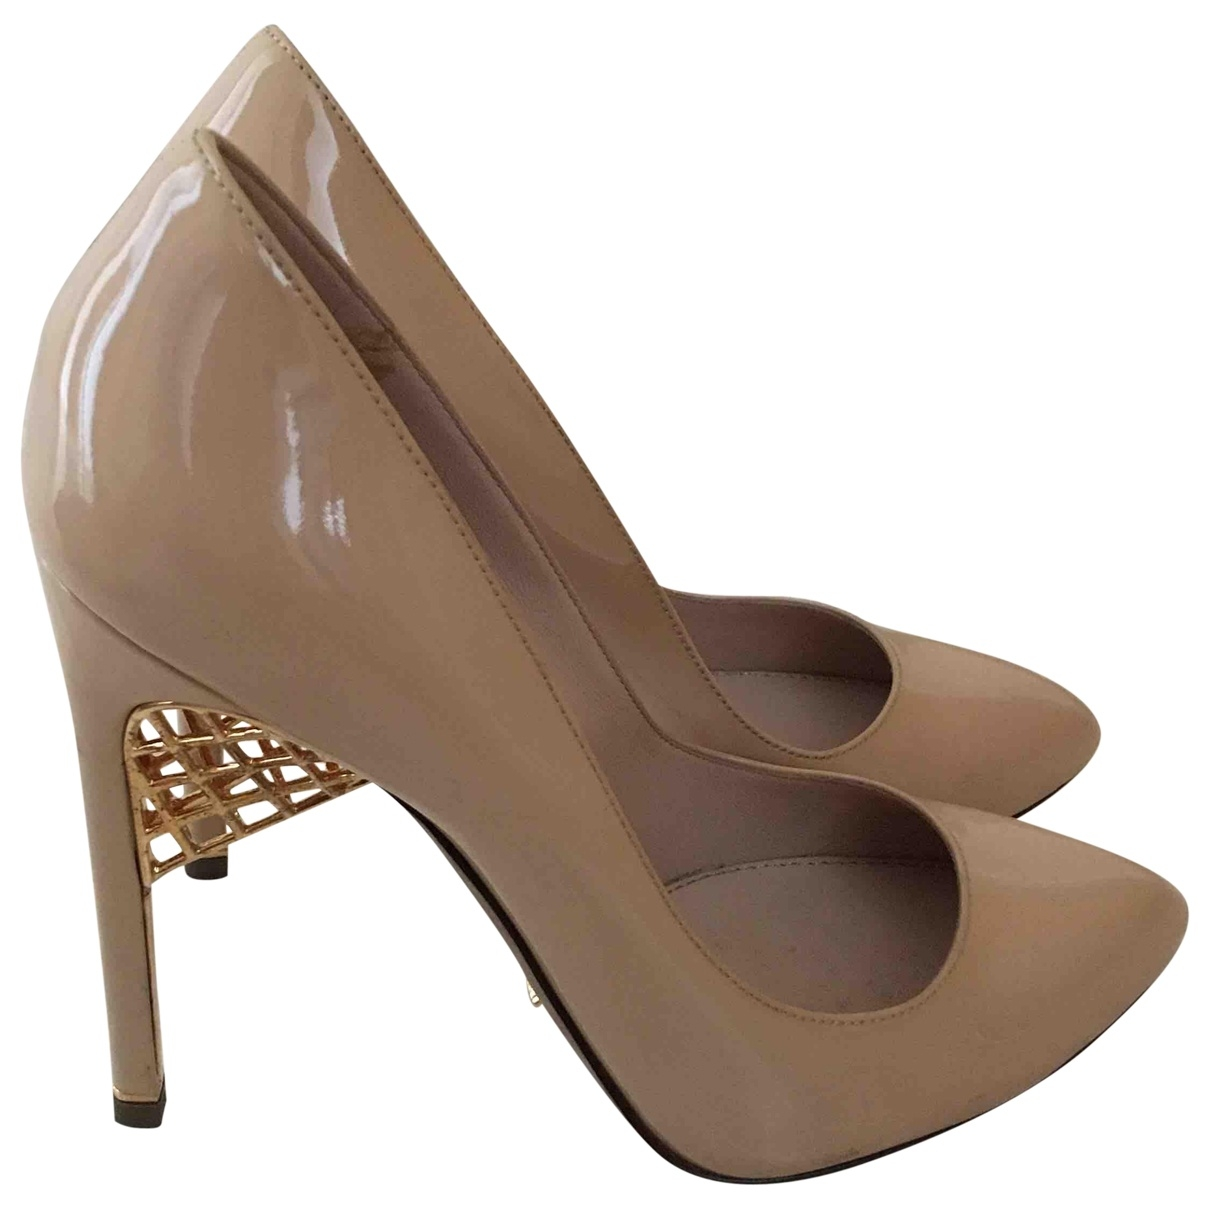 Sergio Rossi - Escarpins   pour femme en cuir verni - beige